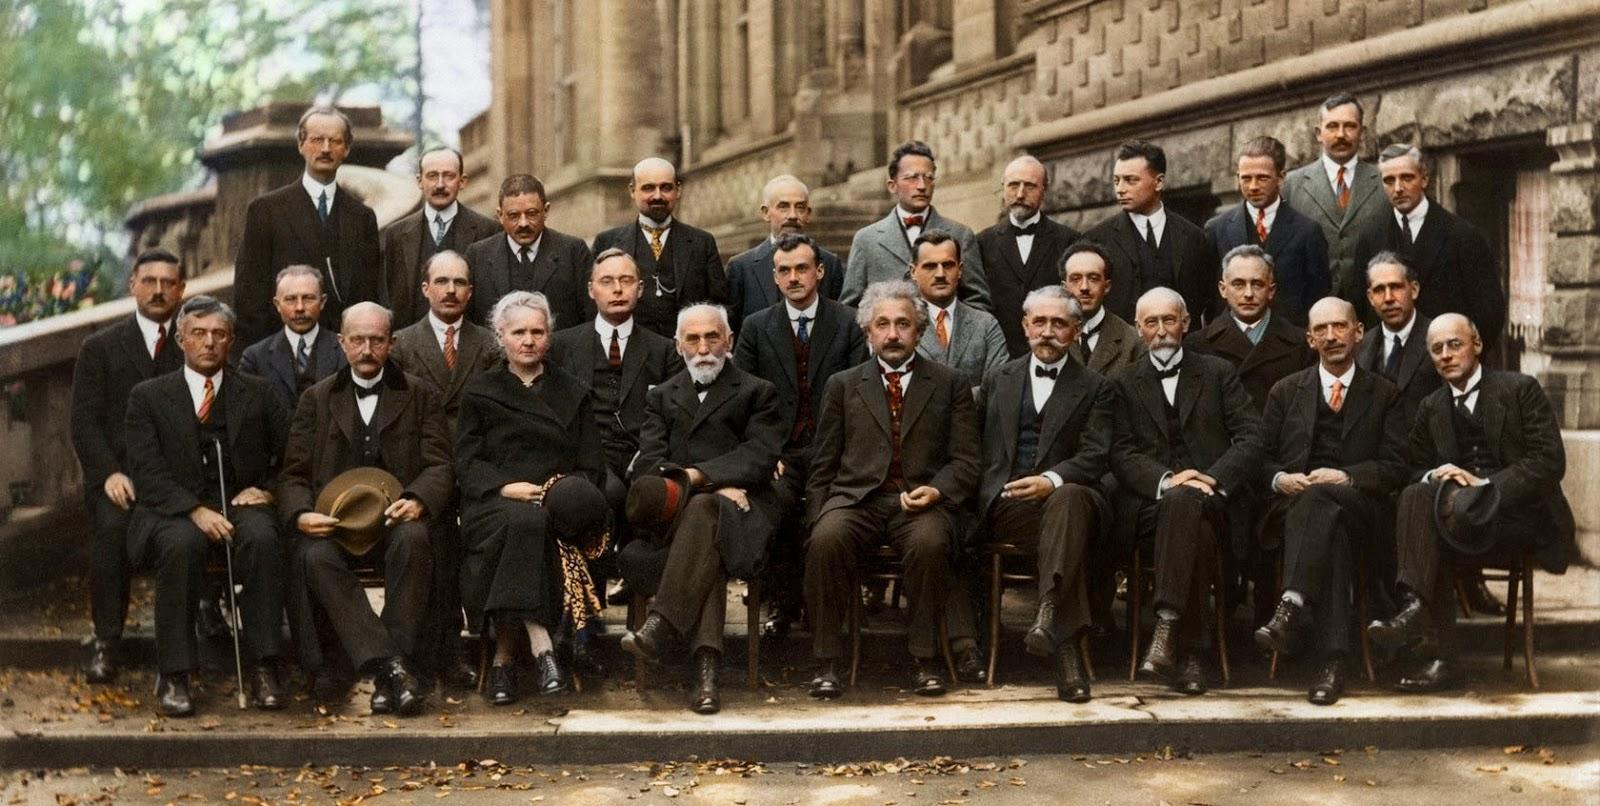 Solvay Conference, Scientists, Einstein, Smartest People